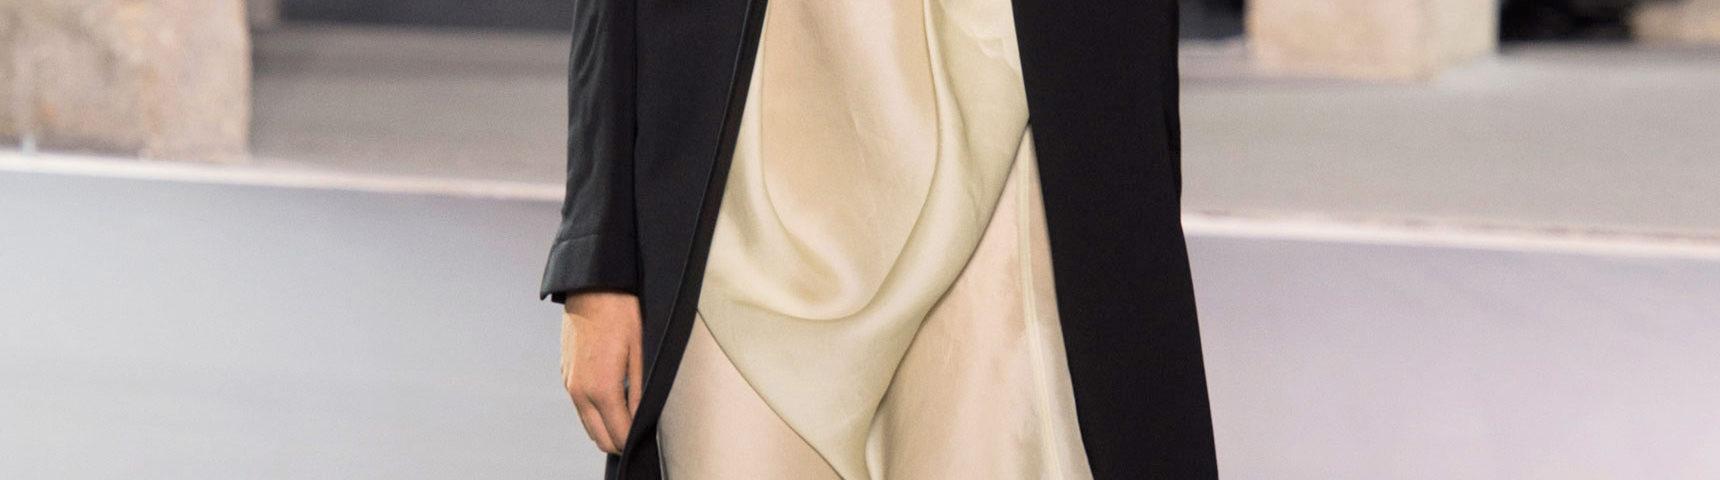 Women's Clothing Fashion Tips For Tall Women